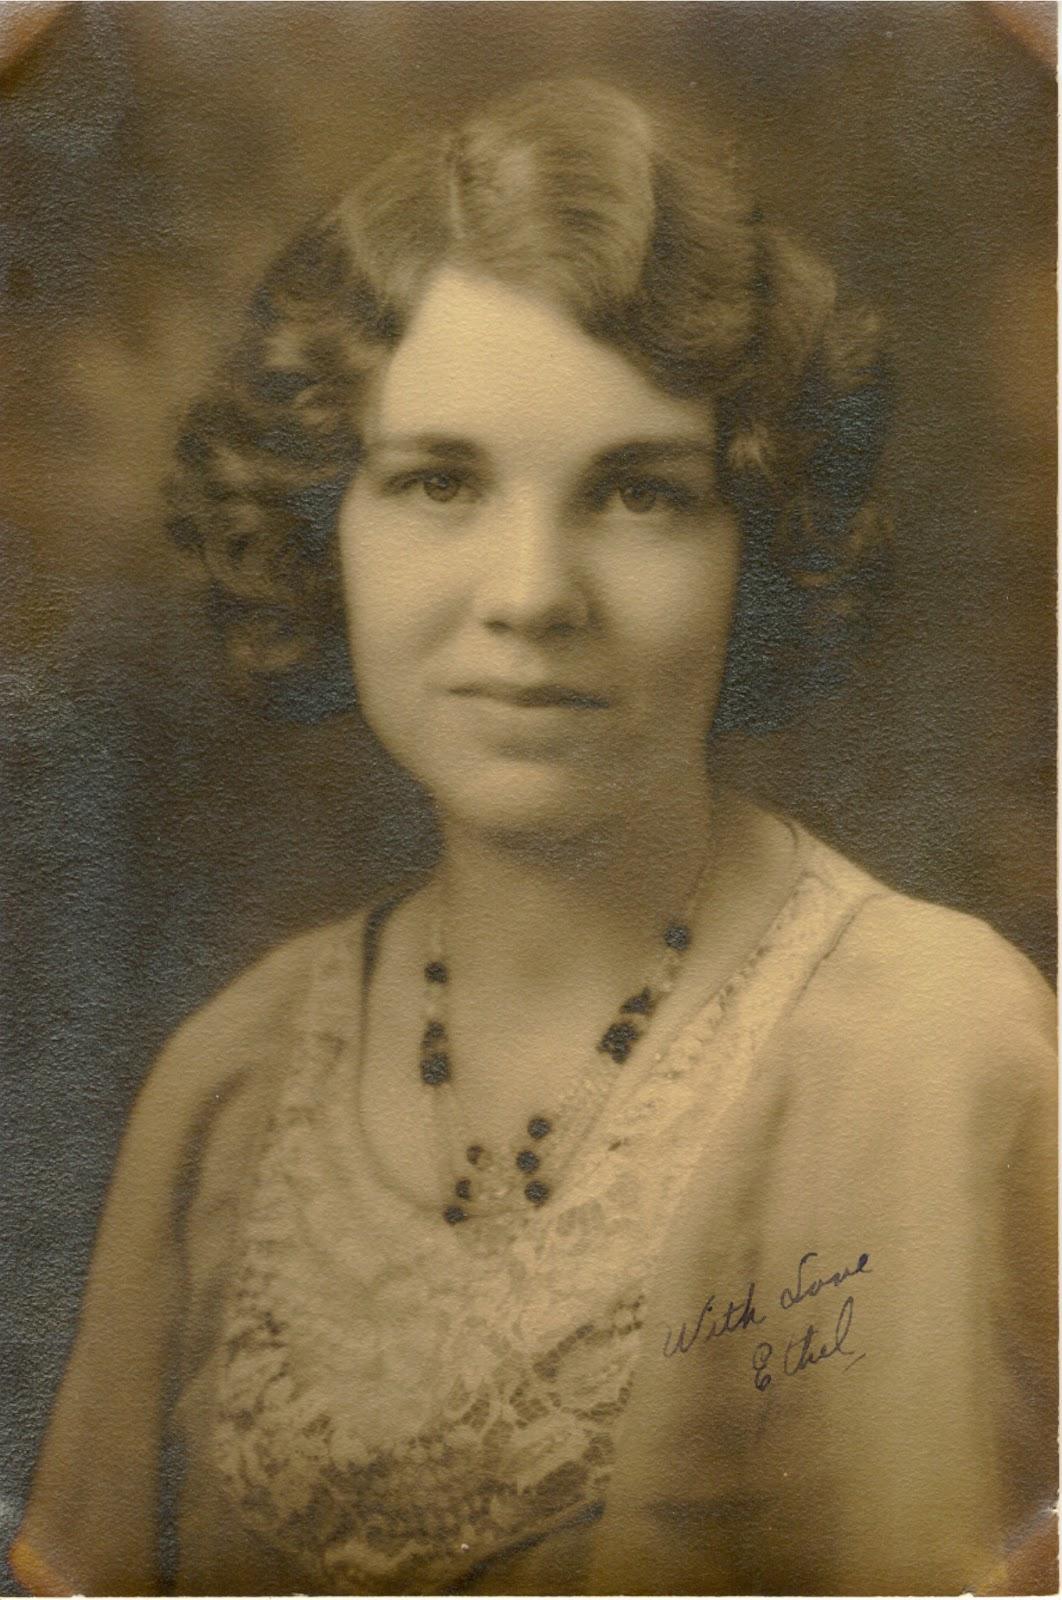 Michigan clinton county elsie - My Grandmother Was Born 06 Jul 1913 In Elsie Clinton County Michigan And Died 12 Nov 1973 In Dublin Laurens County Georgia She Married 1 11 Feb 1934